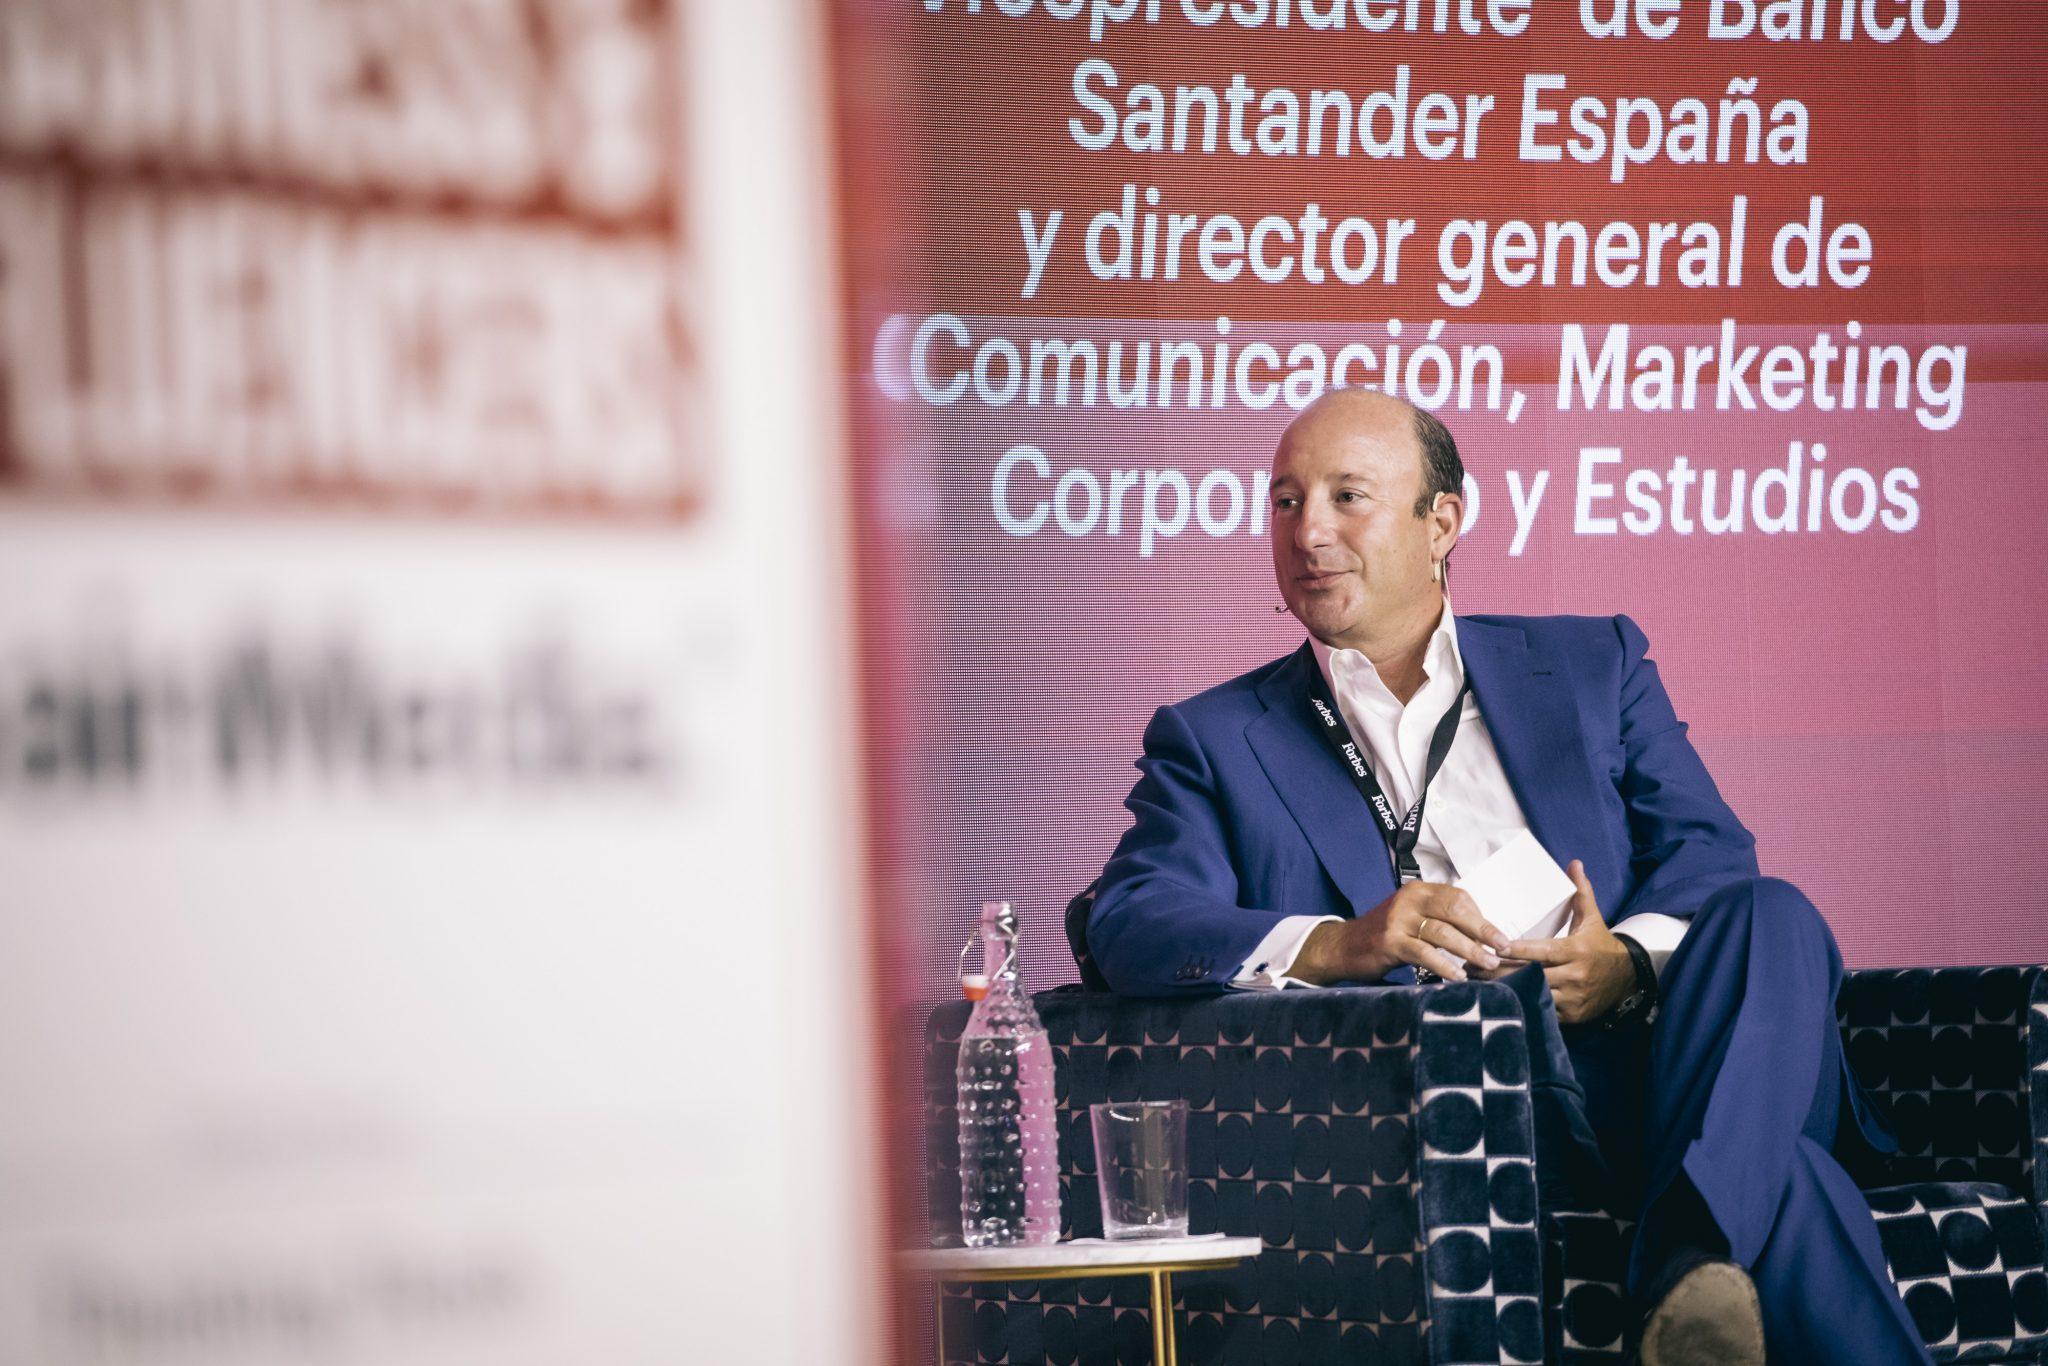 Manuel Cendoya Santander María Pombo, Forbes Summit Business Influencers